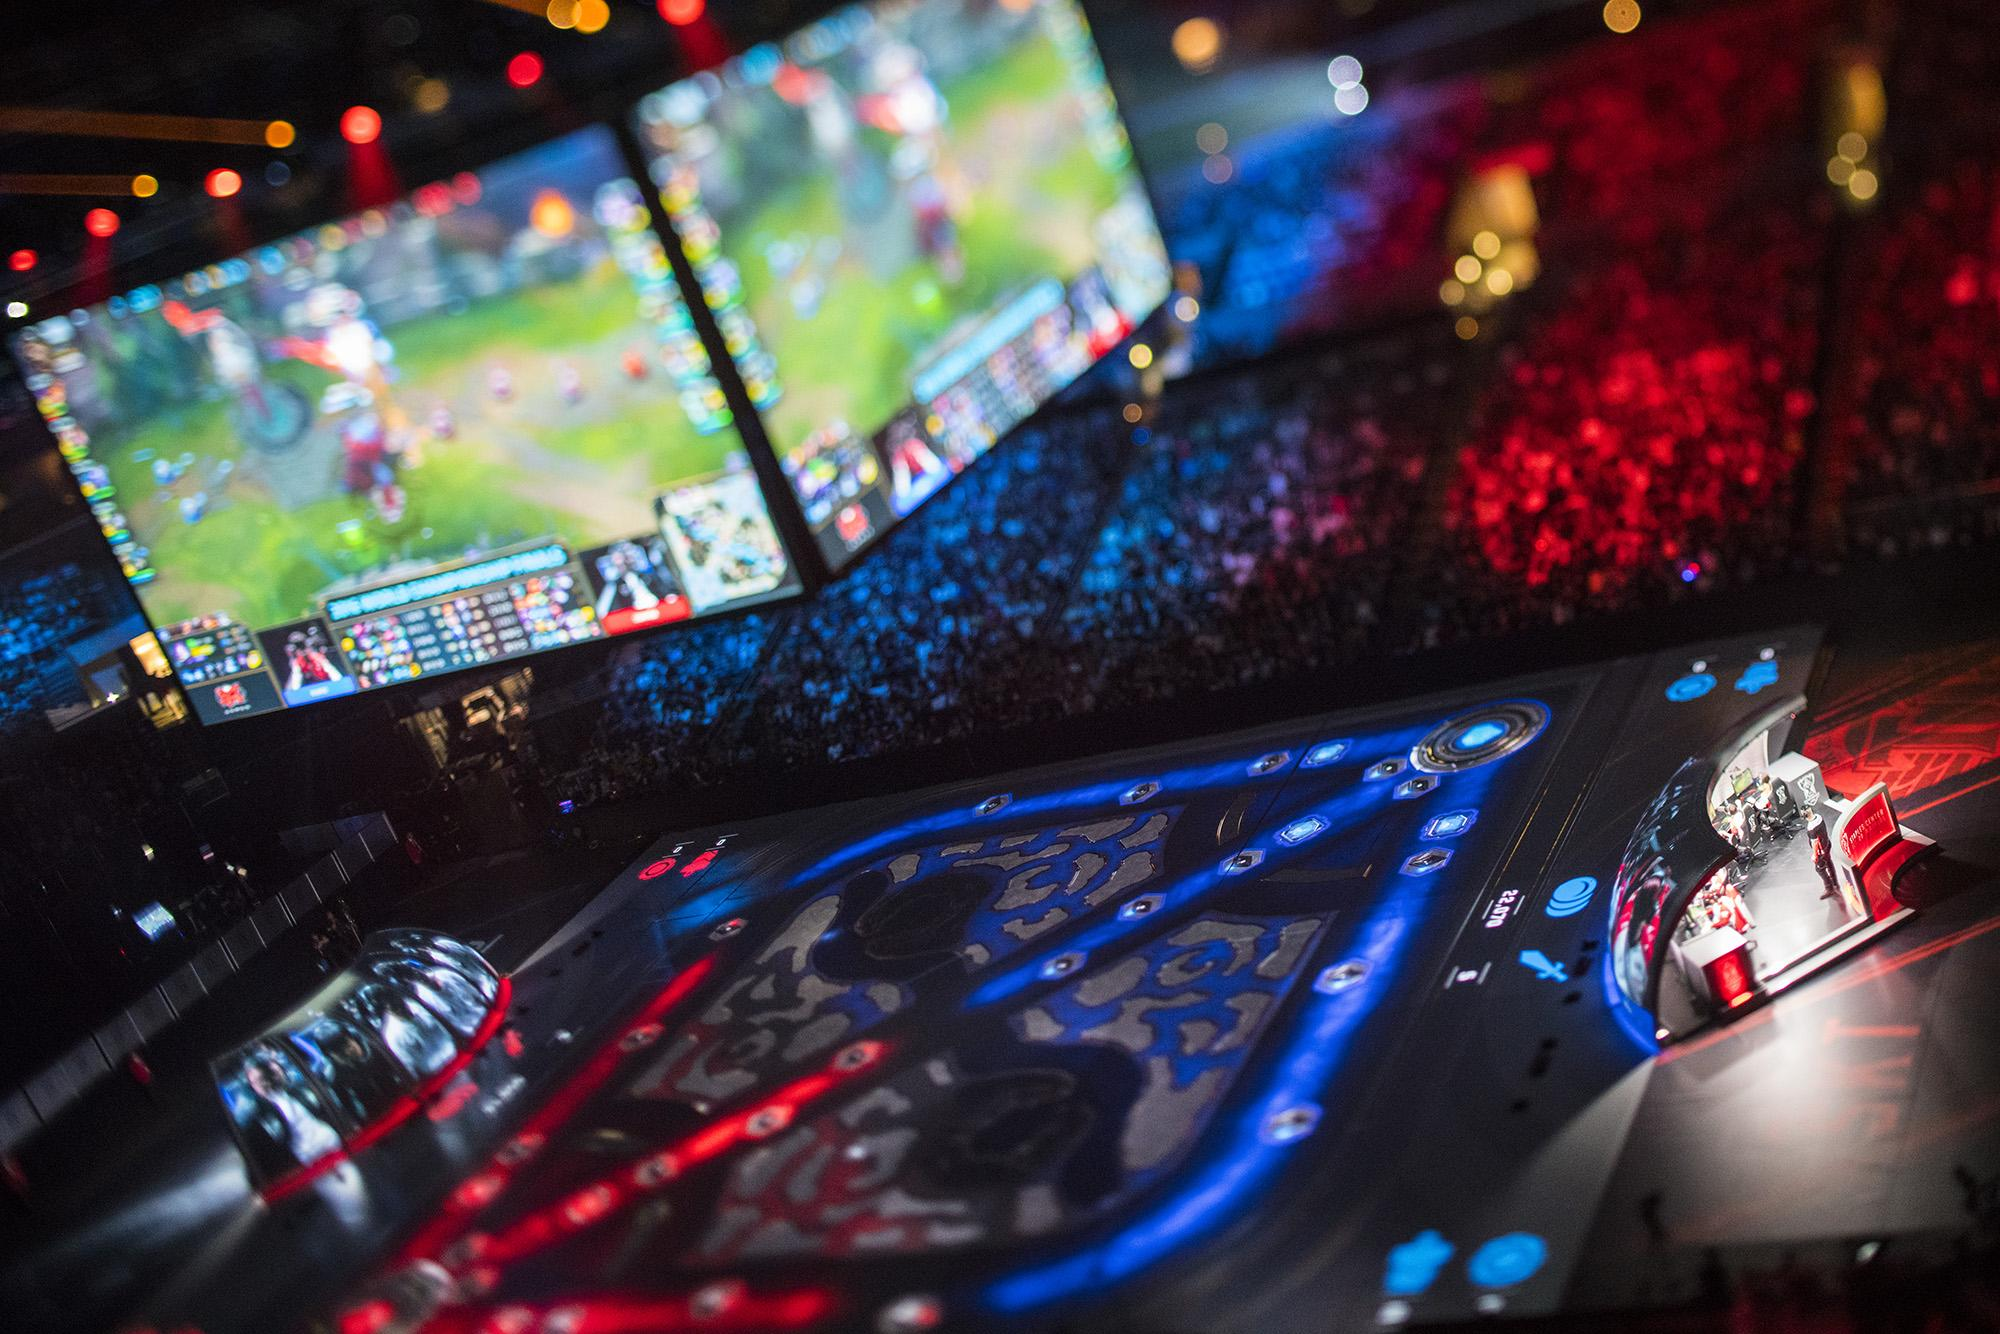 Thumbnail for 2016 League of Legends World Championship Final